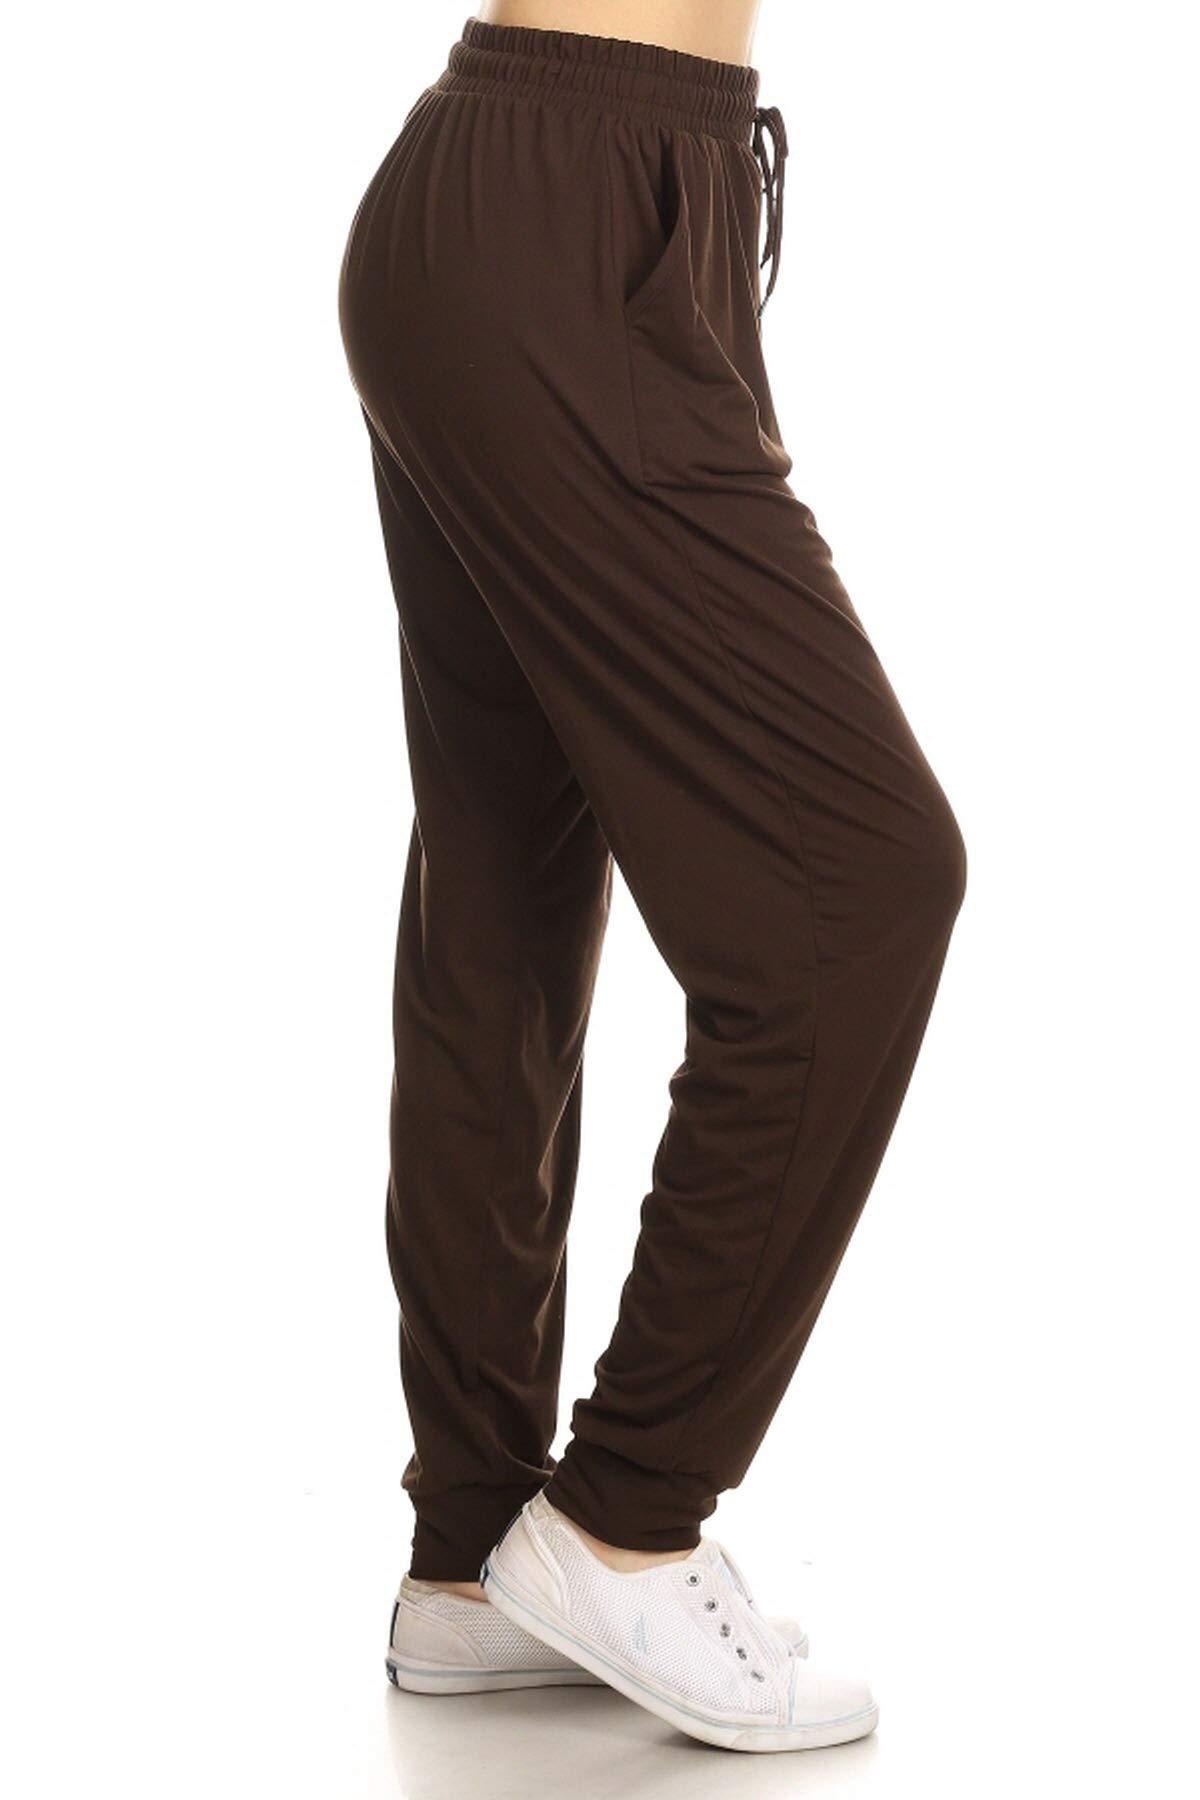 Leggings Depot 优质慢跑者女士流行印花高腰运动裤(S-XL)